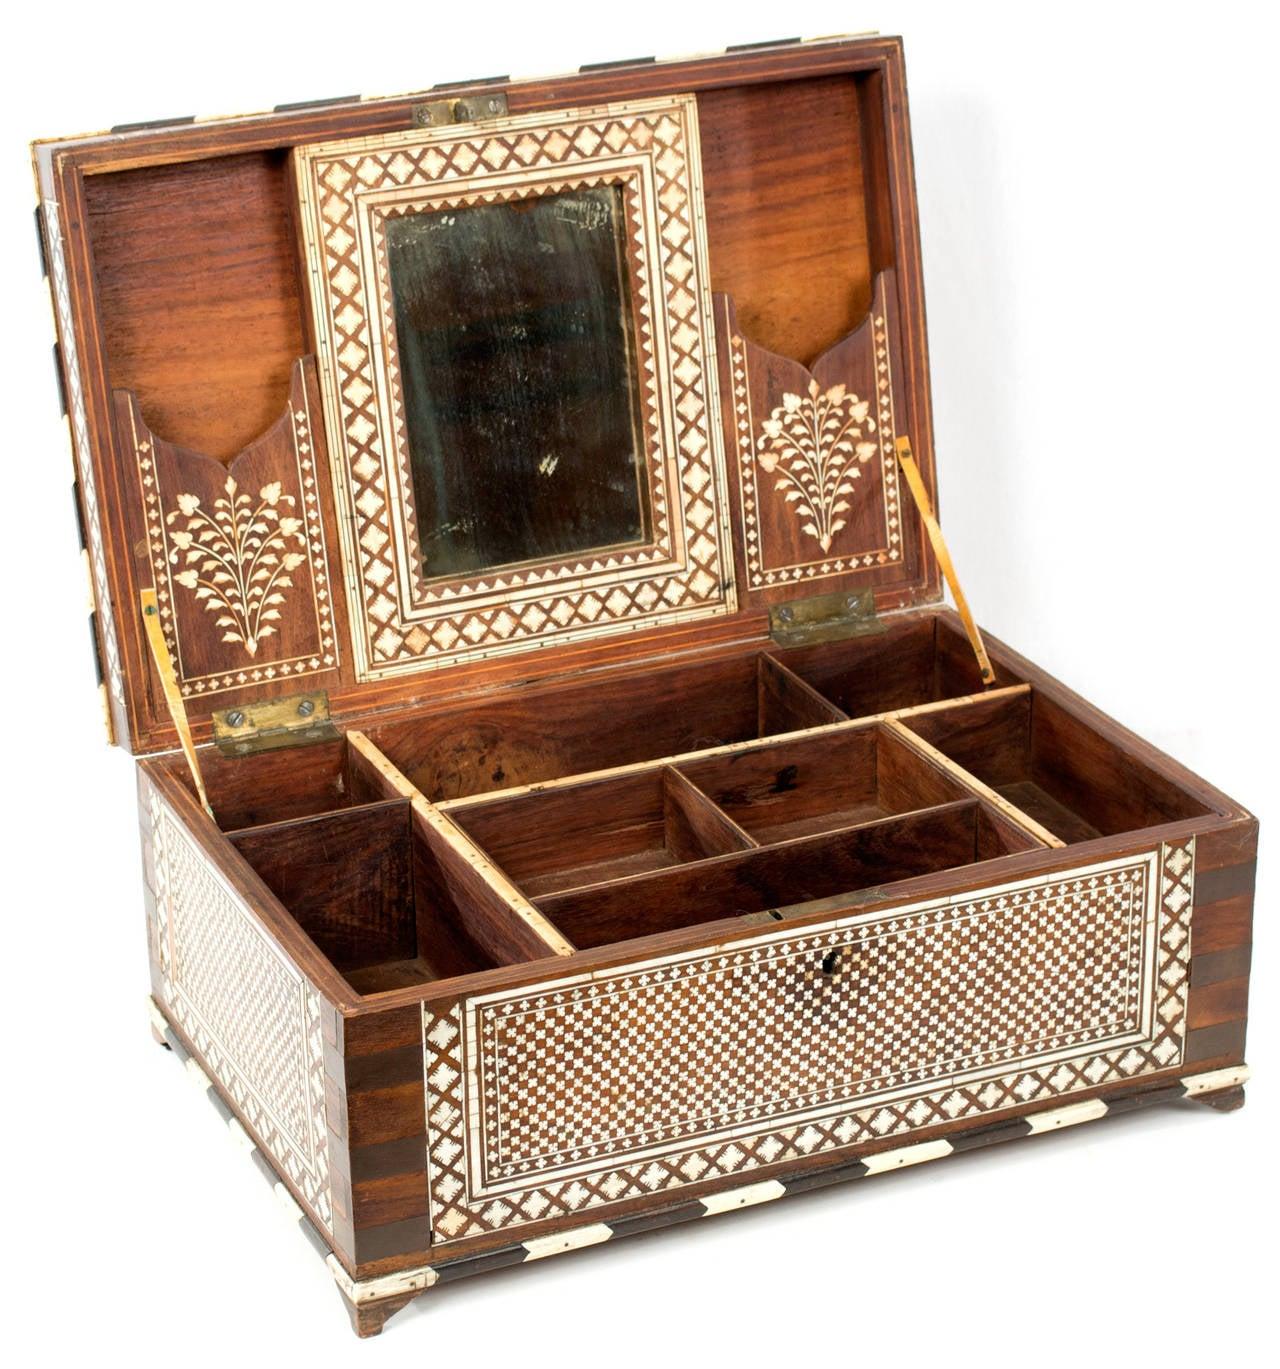 A Nineteenth Century Indochine Inlaid Bone Jewelry Box At